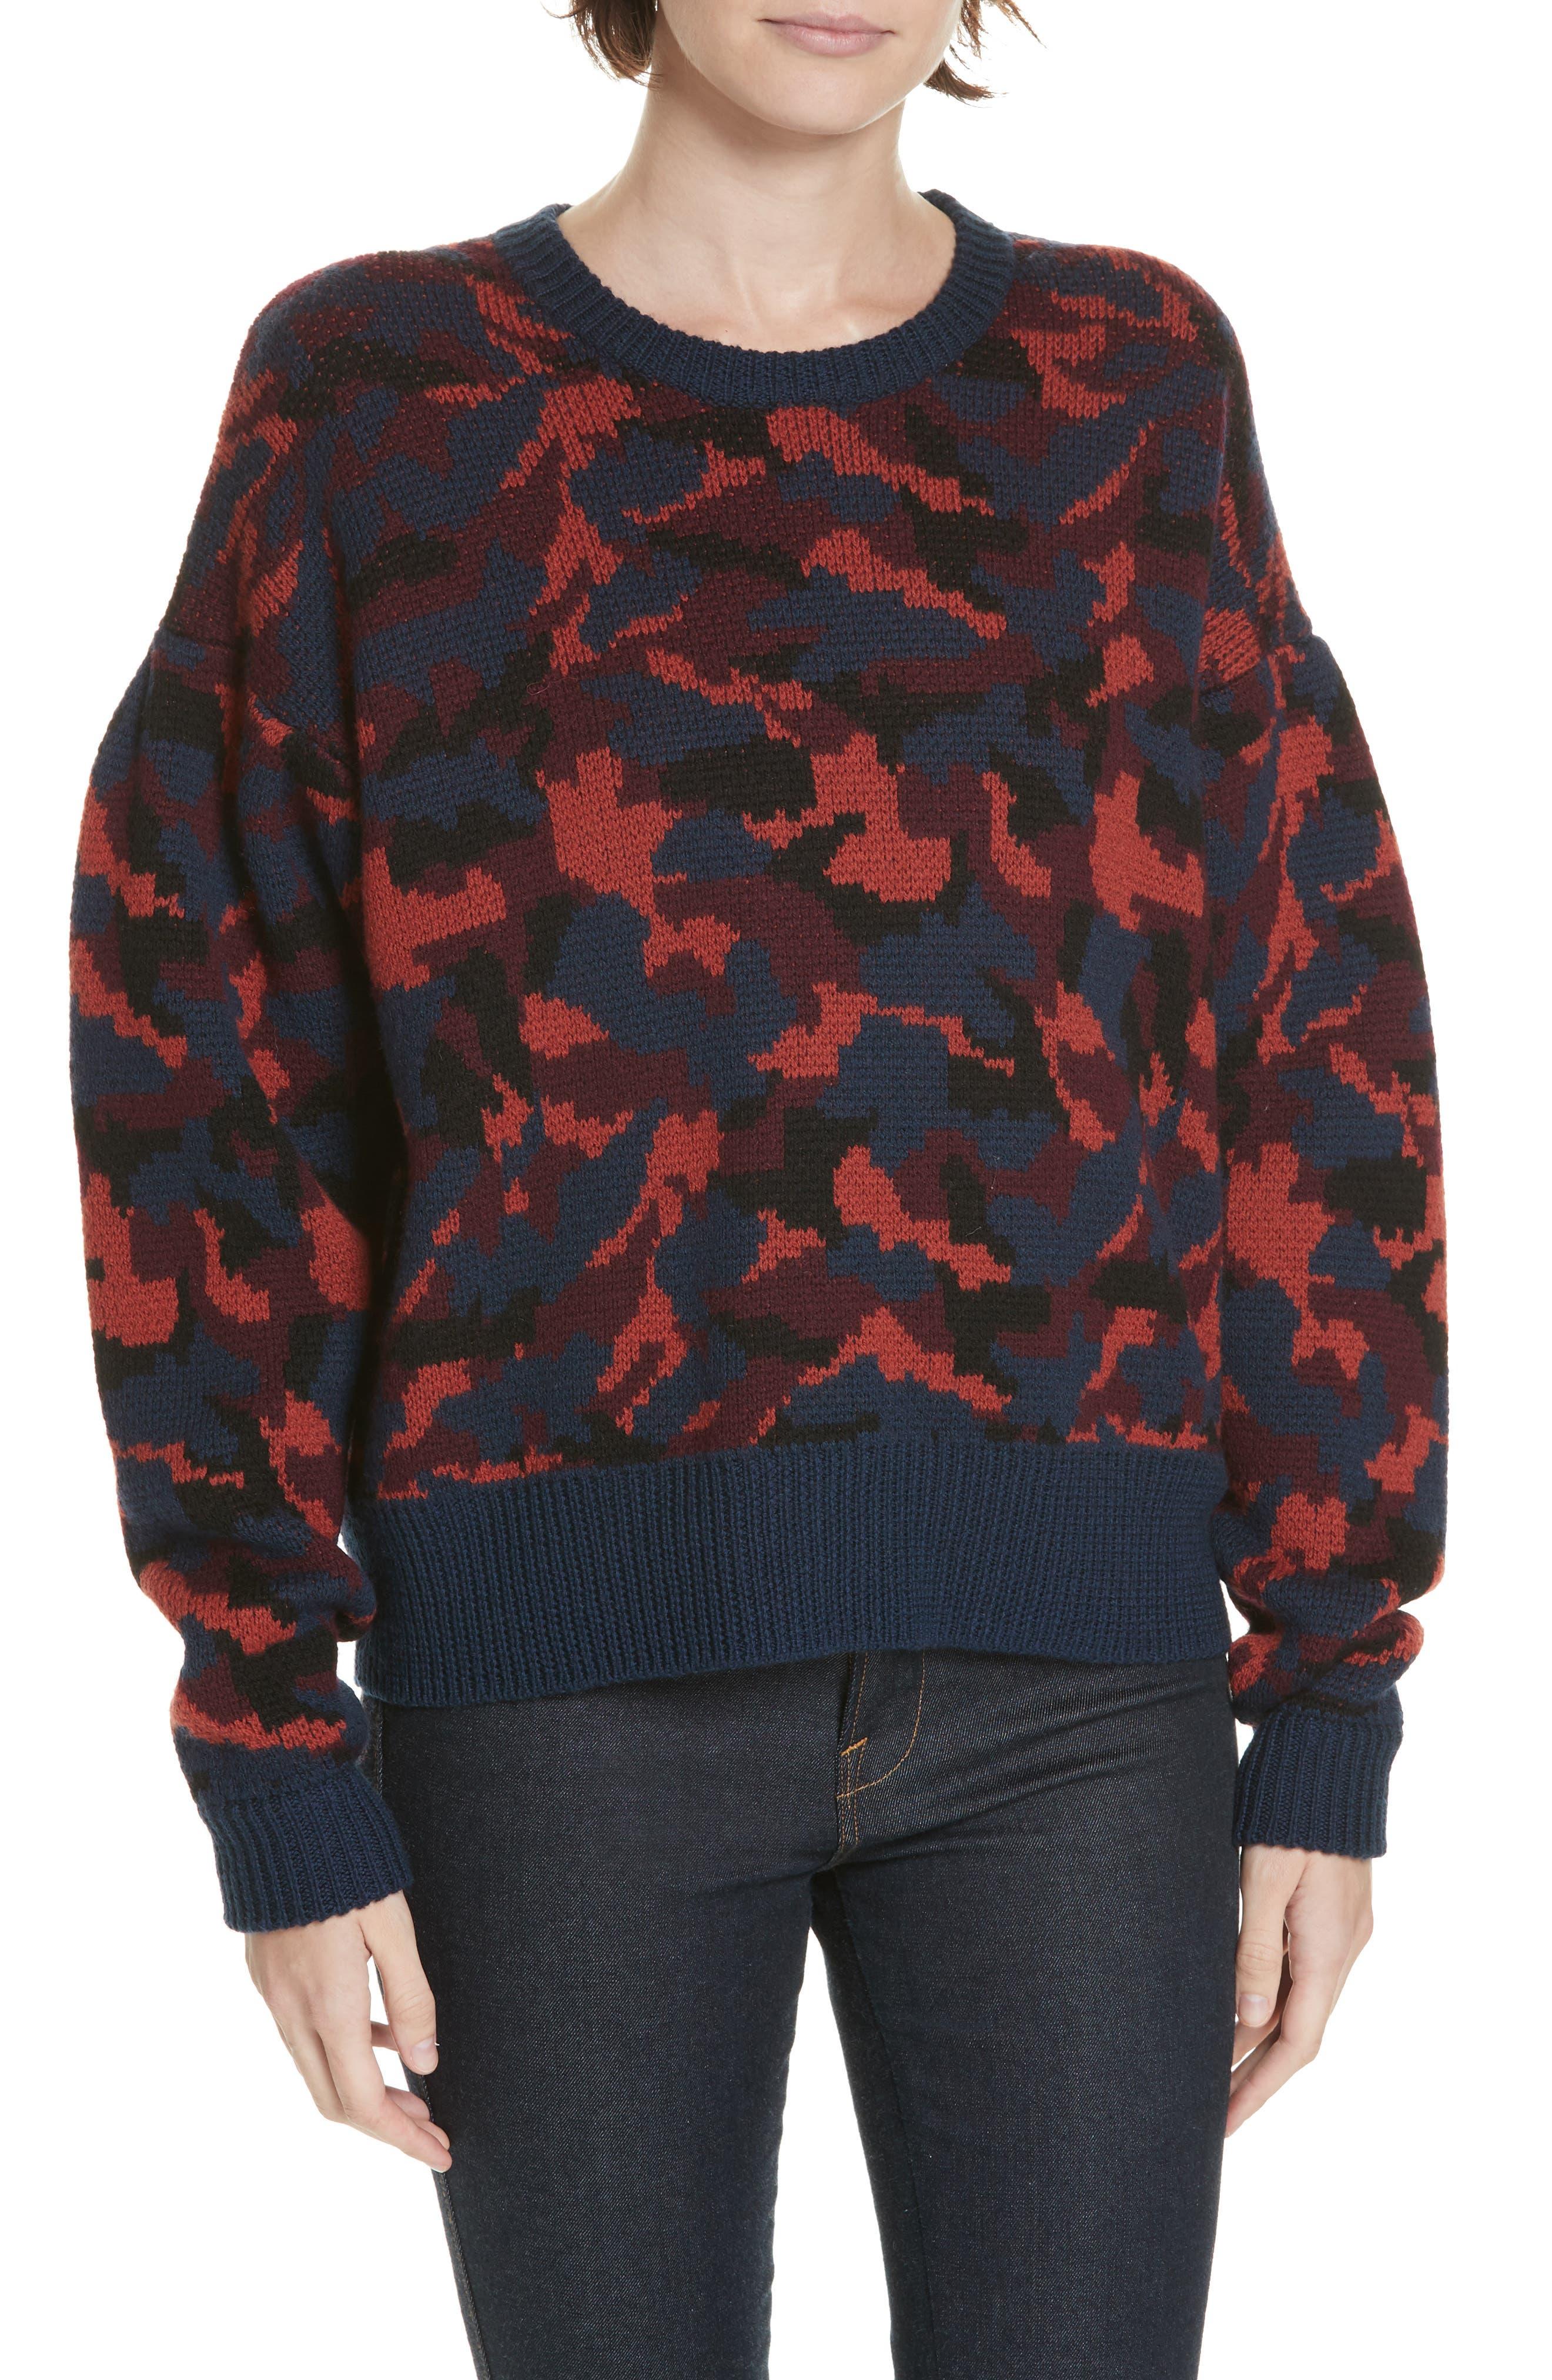 Joie Brycen Merino Wool Sweater